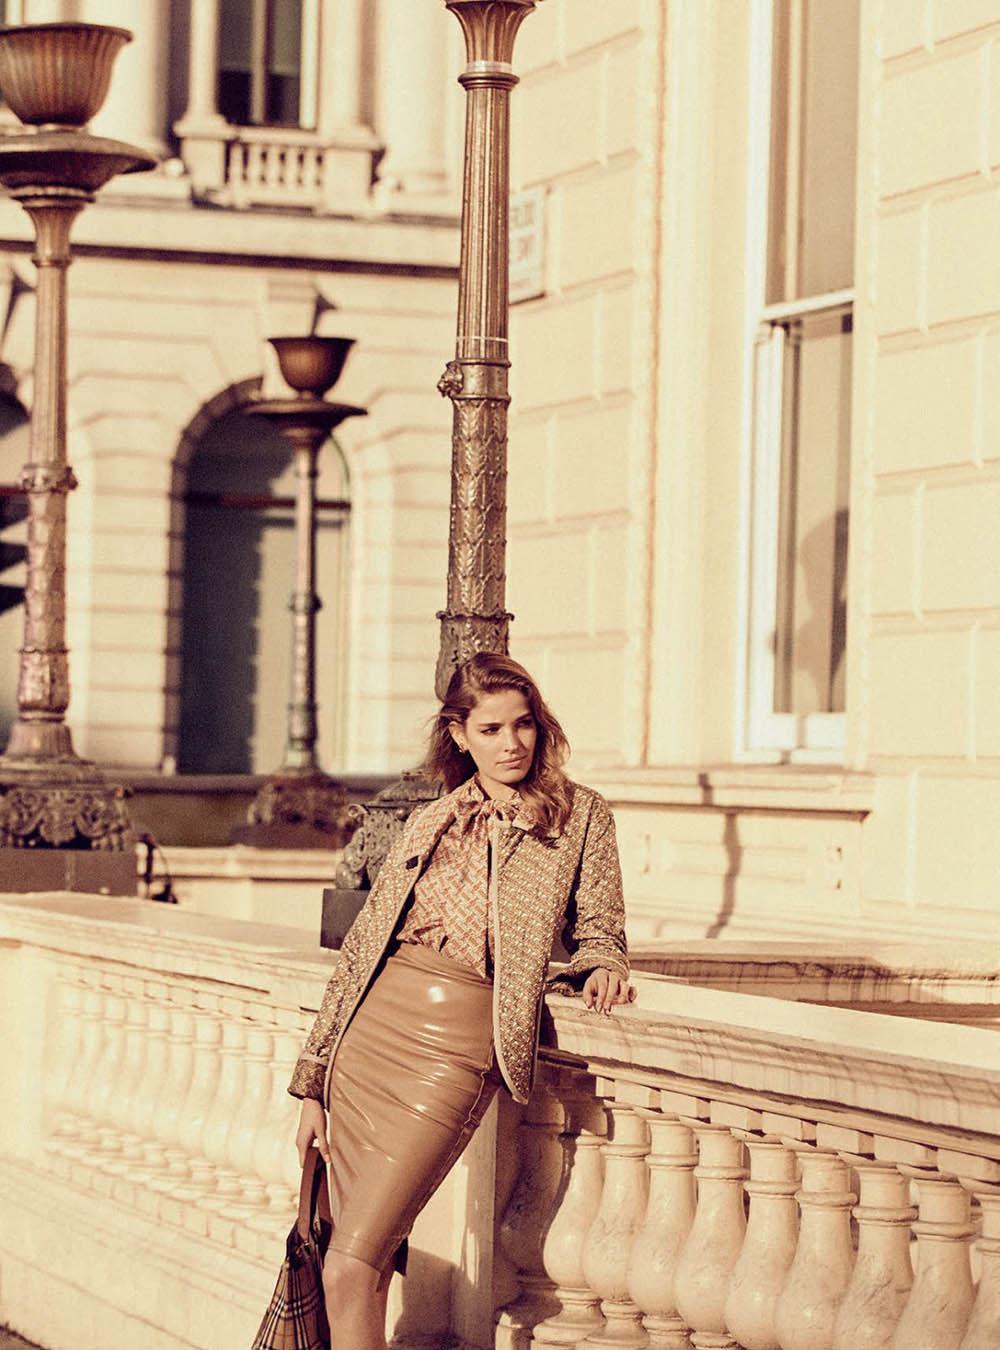 Alisa-Ahmann-by-Regan-Cameron-for-Harper's-Bazaar-UK-March-2019-13.jpg